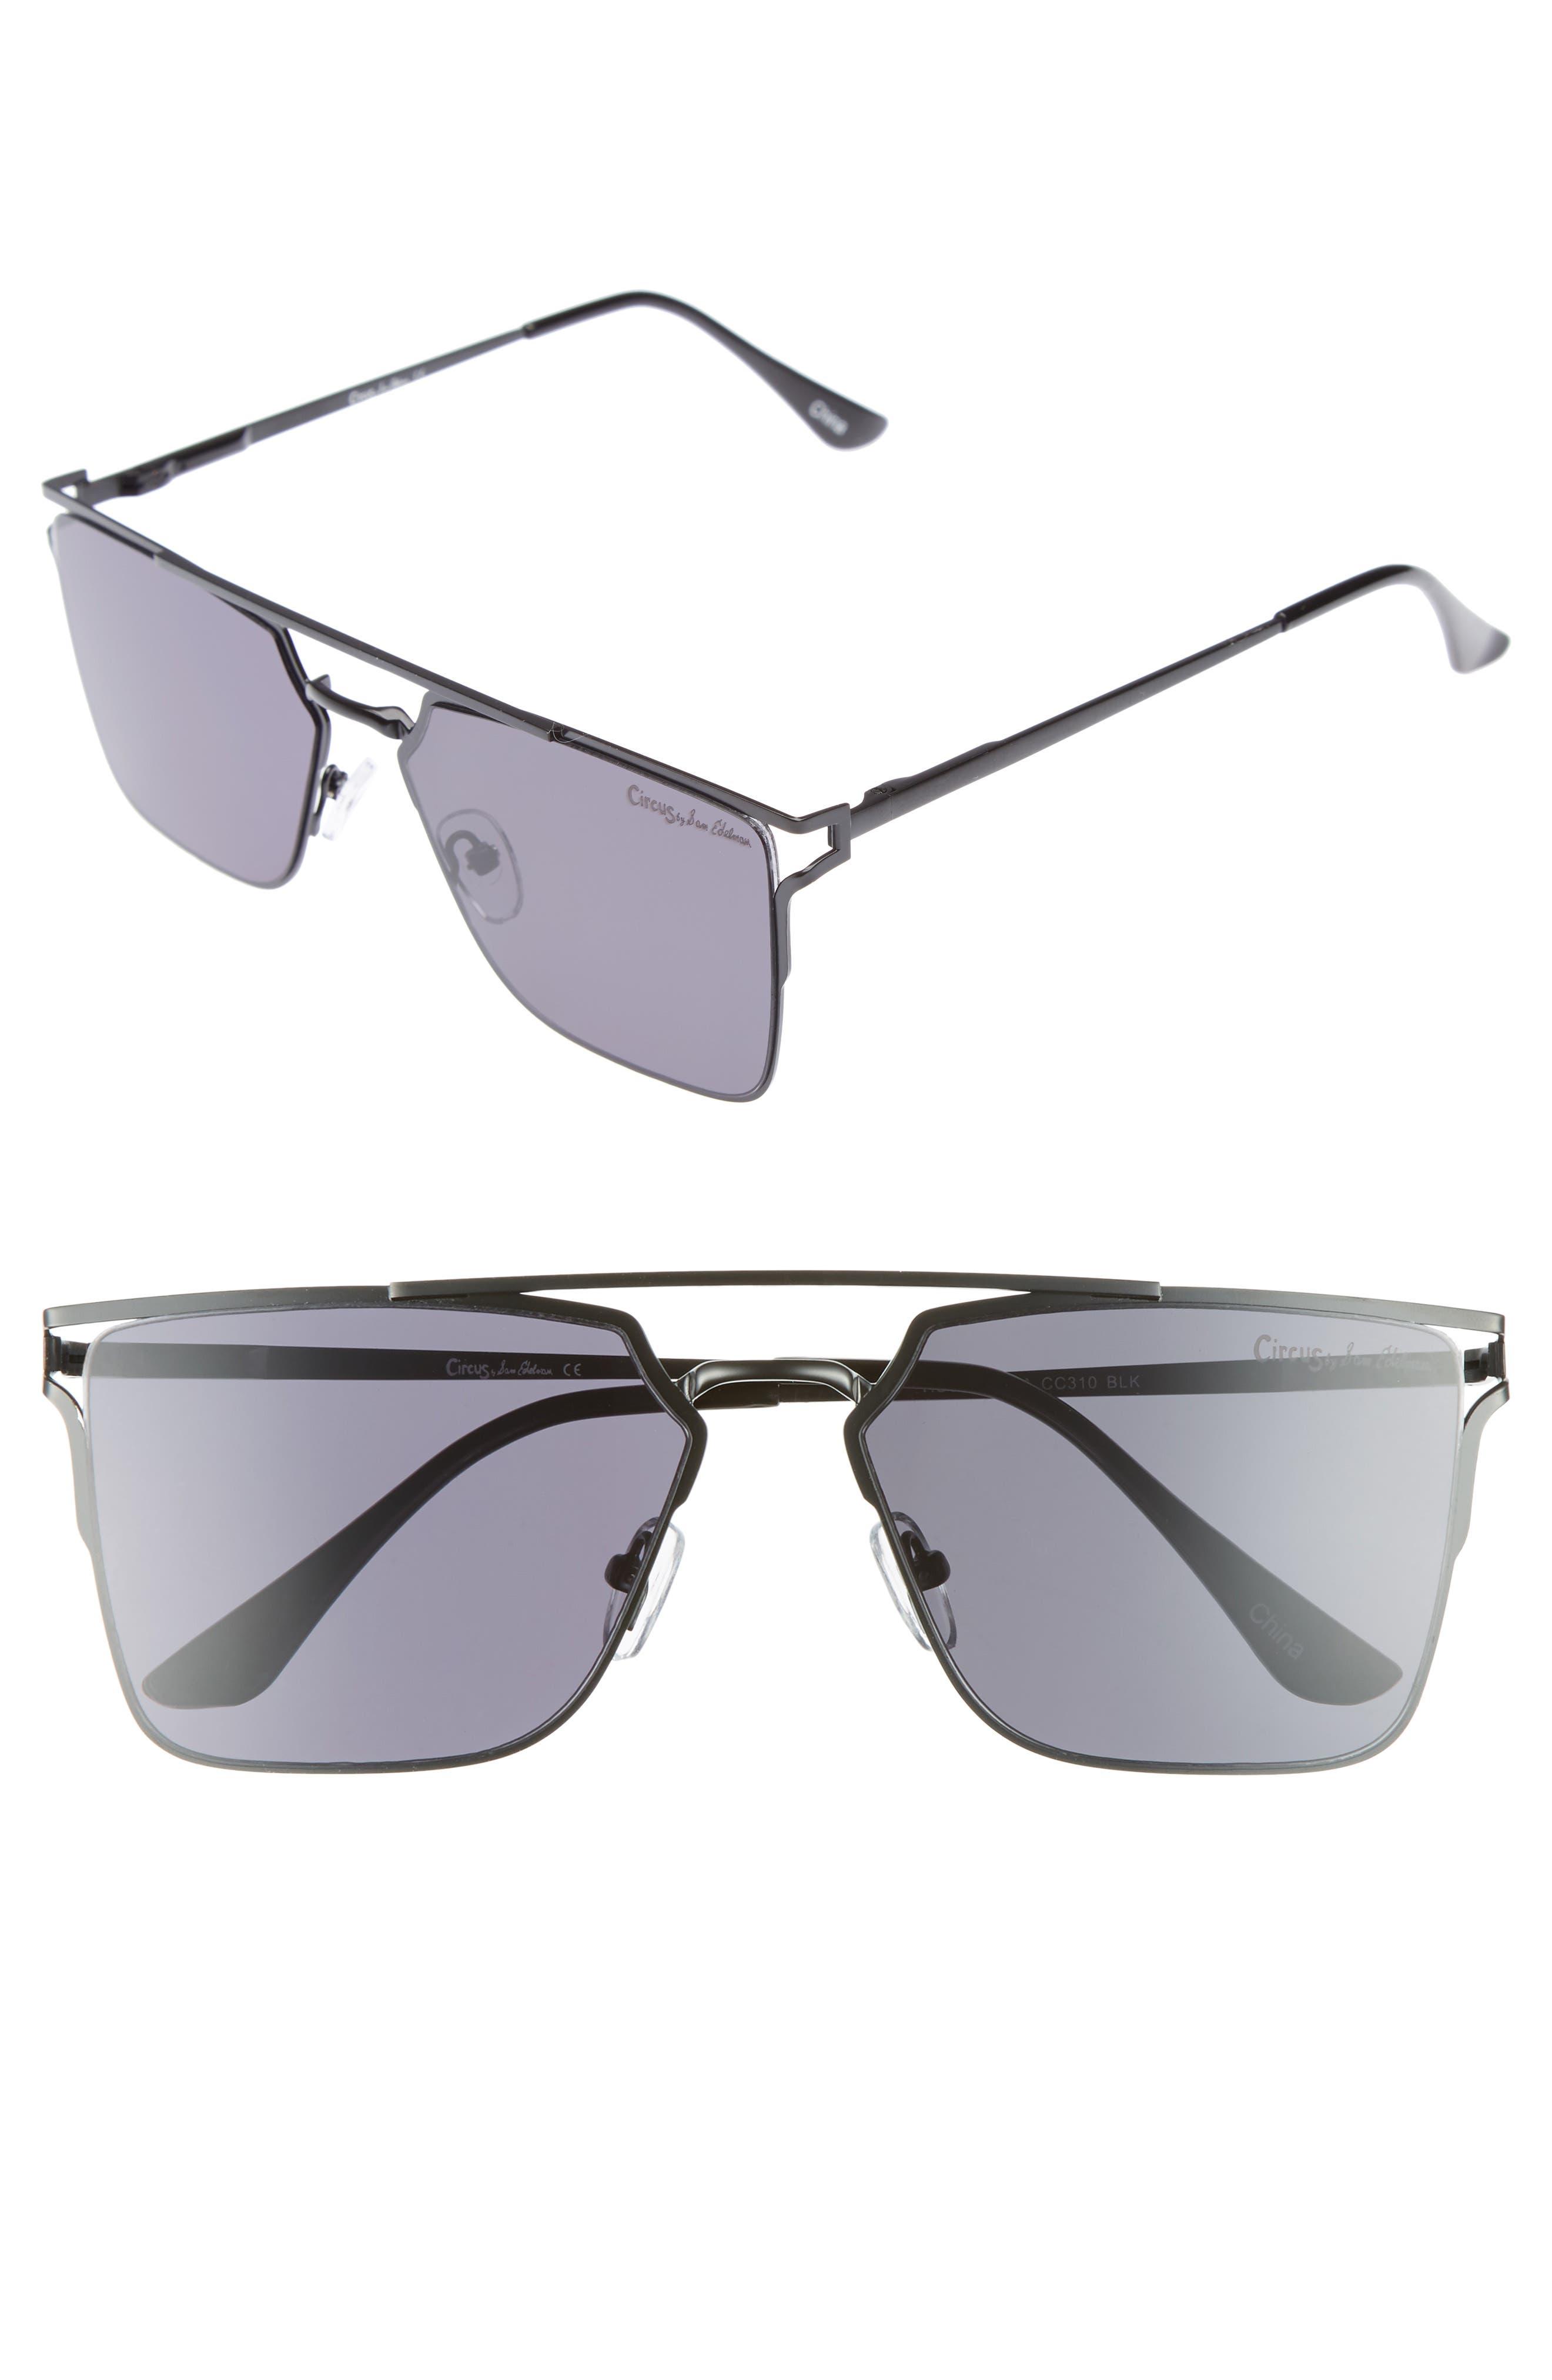 56mm Flat Top Sunglasses,                             Main thumbnail 1, color,                             001